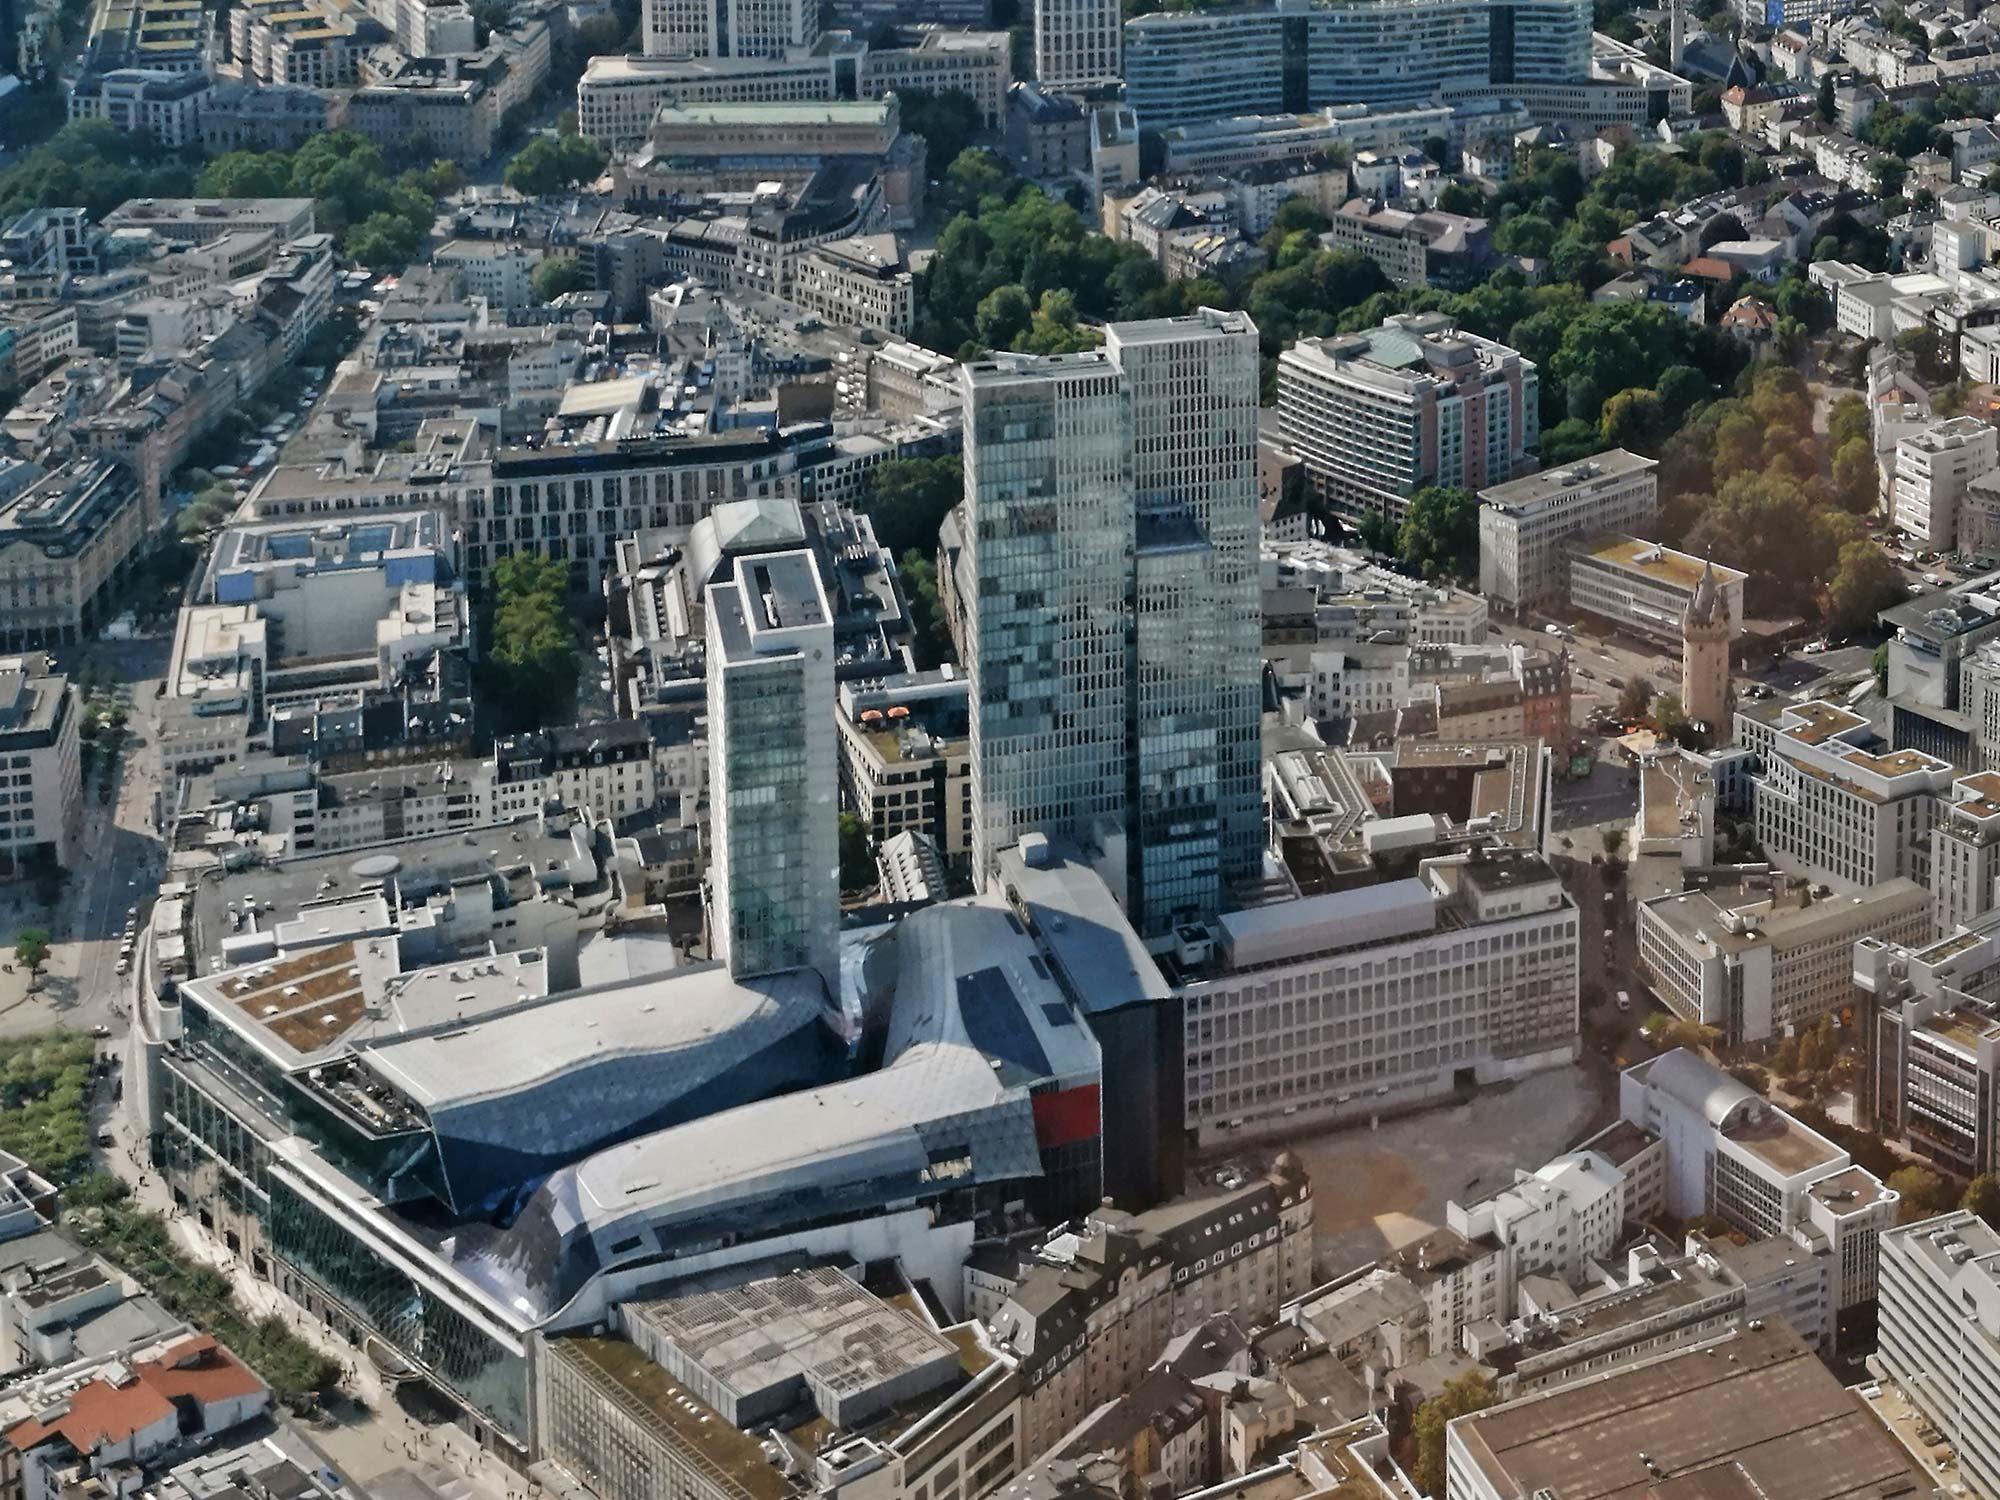 Palaisquartier Frankfurt - Palais Quartier FFM - links: Jumeirah Hotel Hochhaus - rechts daneben: Nextower - hier aufgenommen 2019